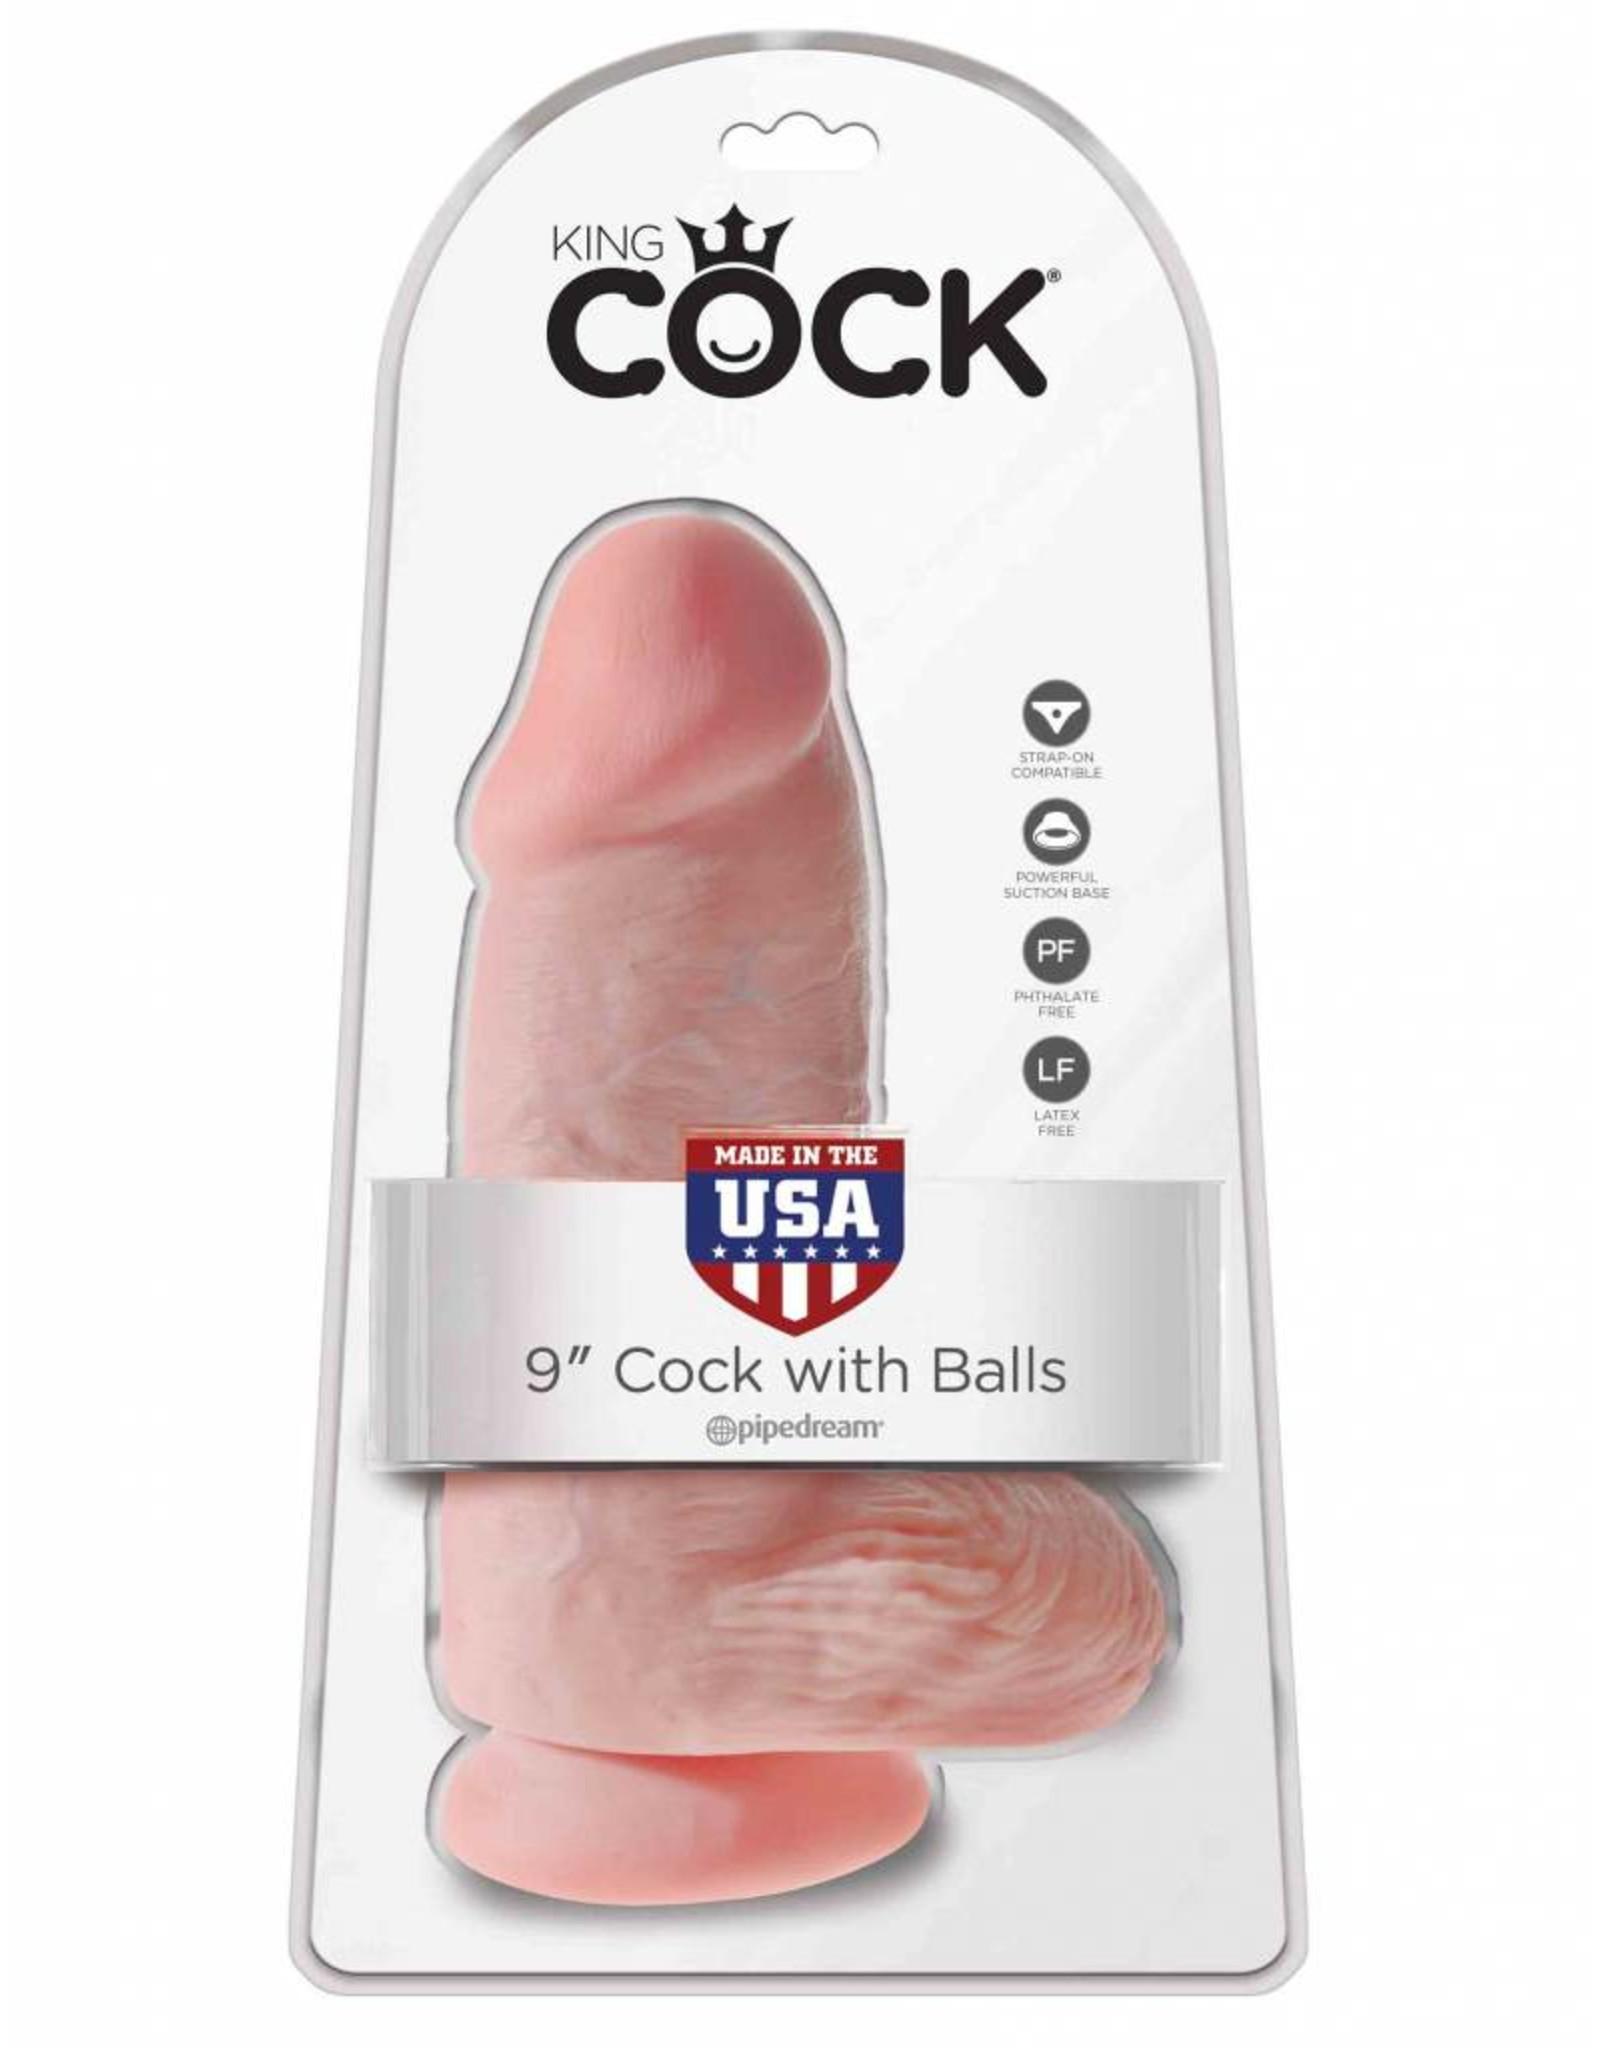 "King Cock King Cock with Balls 9"" Chubby"